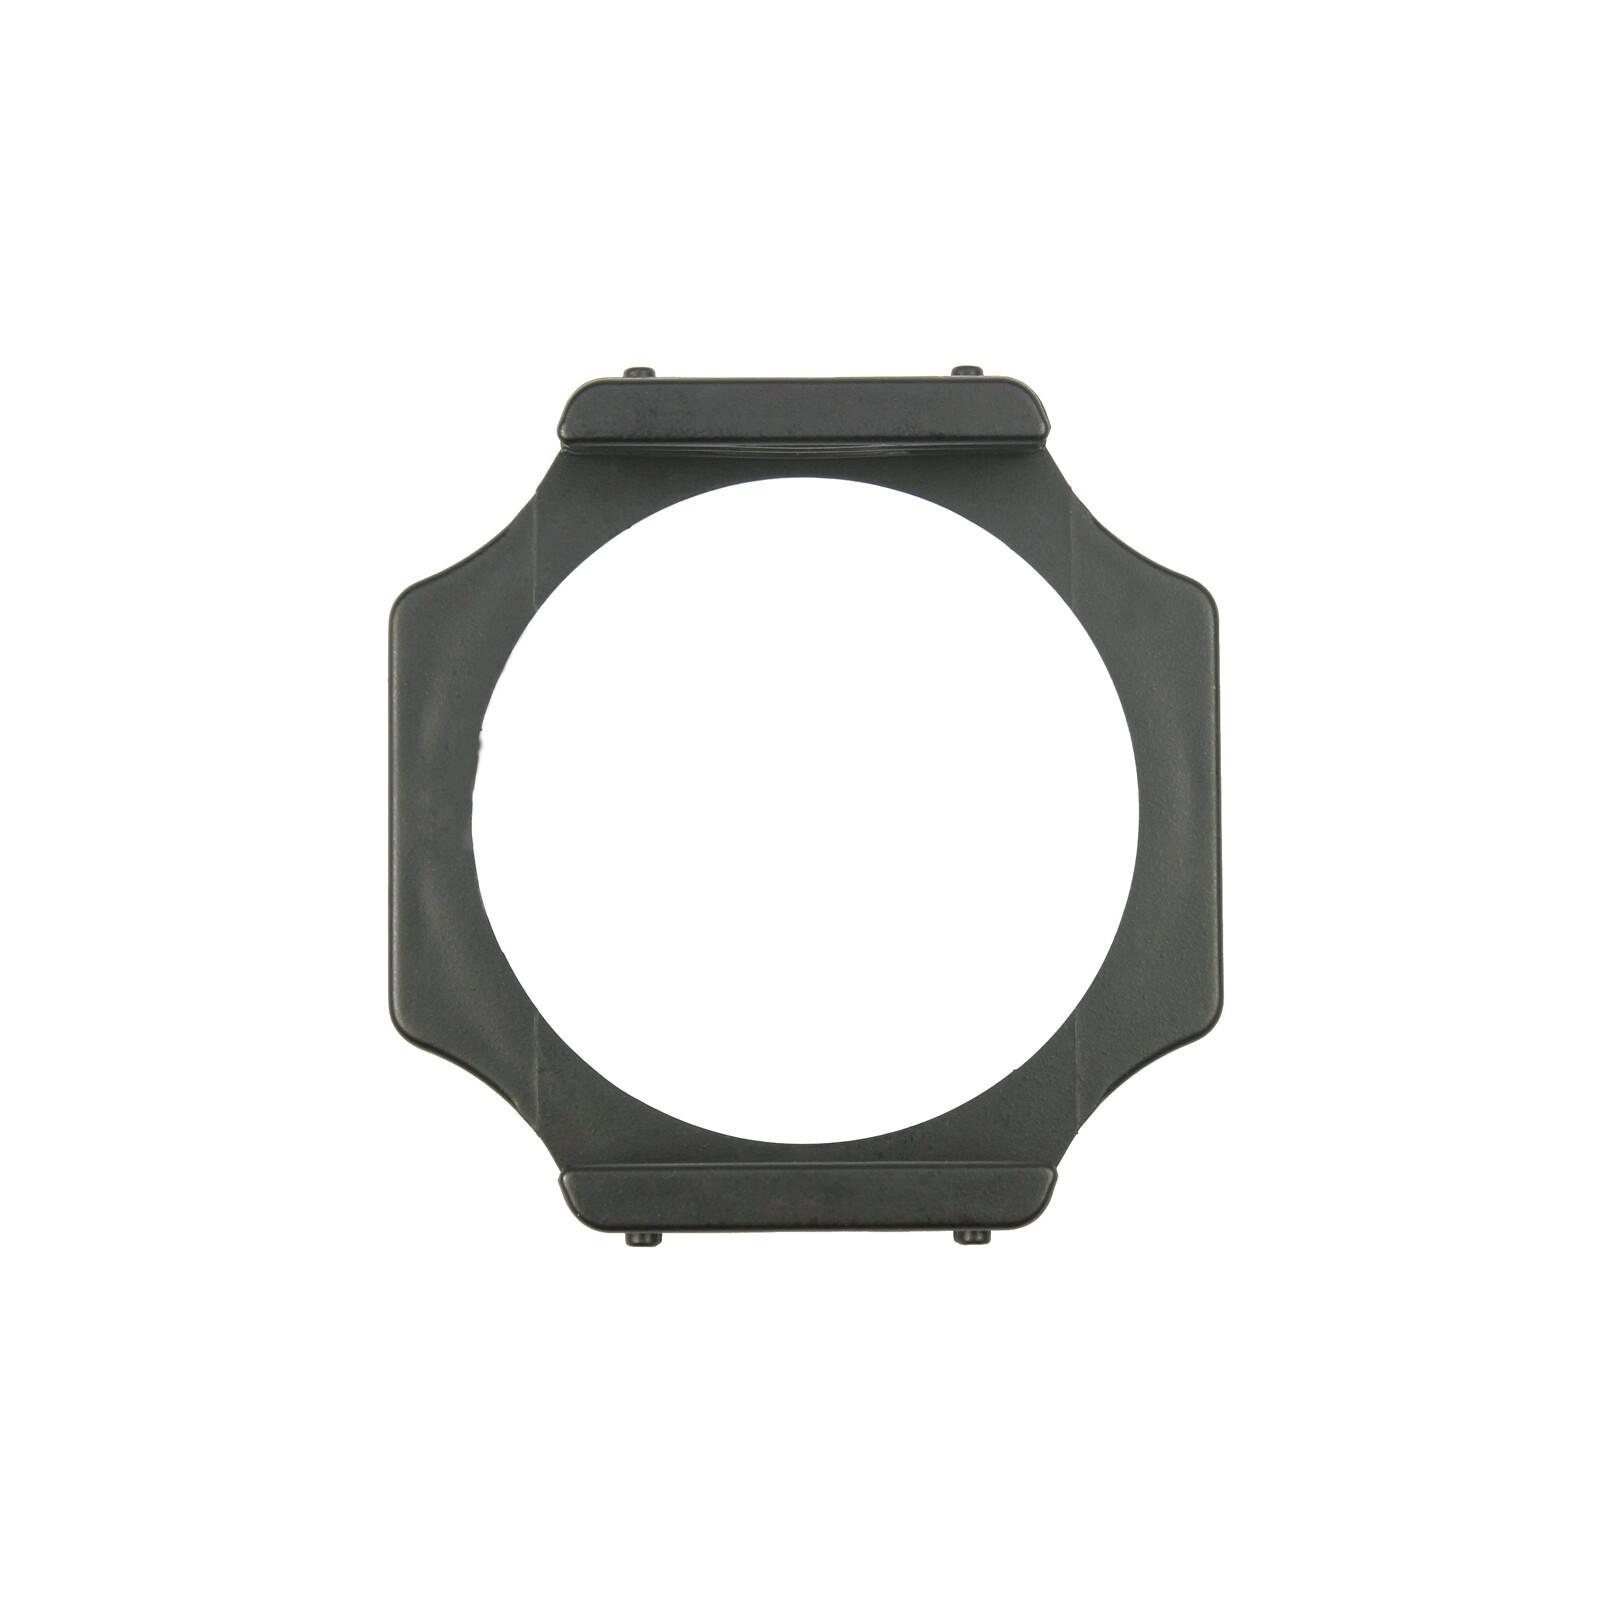 Dörr Go2 Metall Anschlussring 82mm